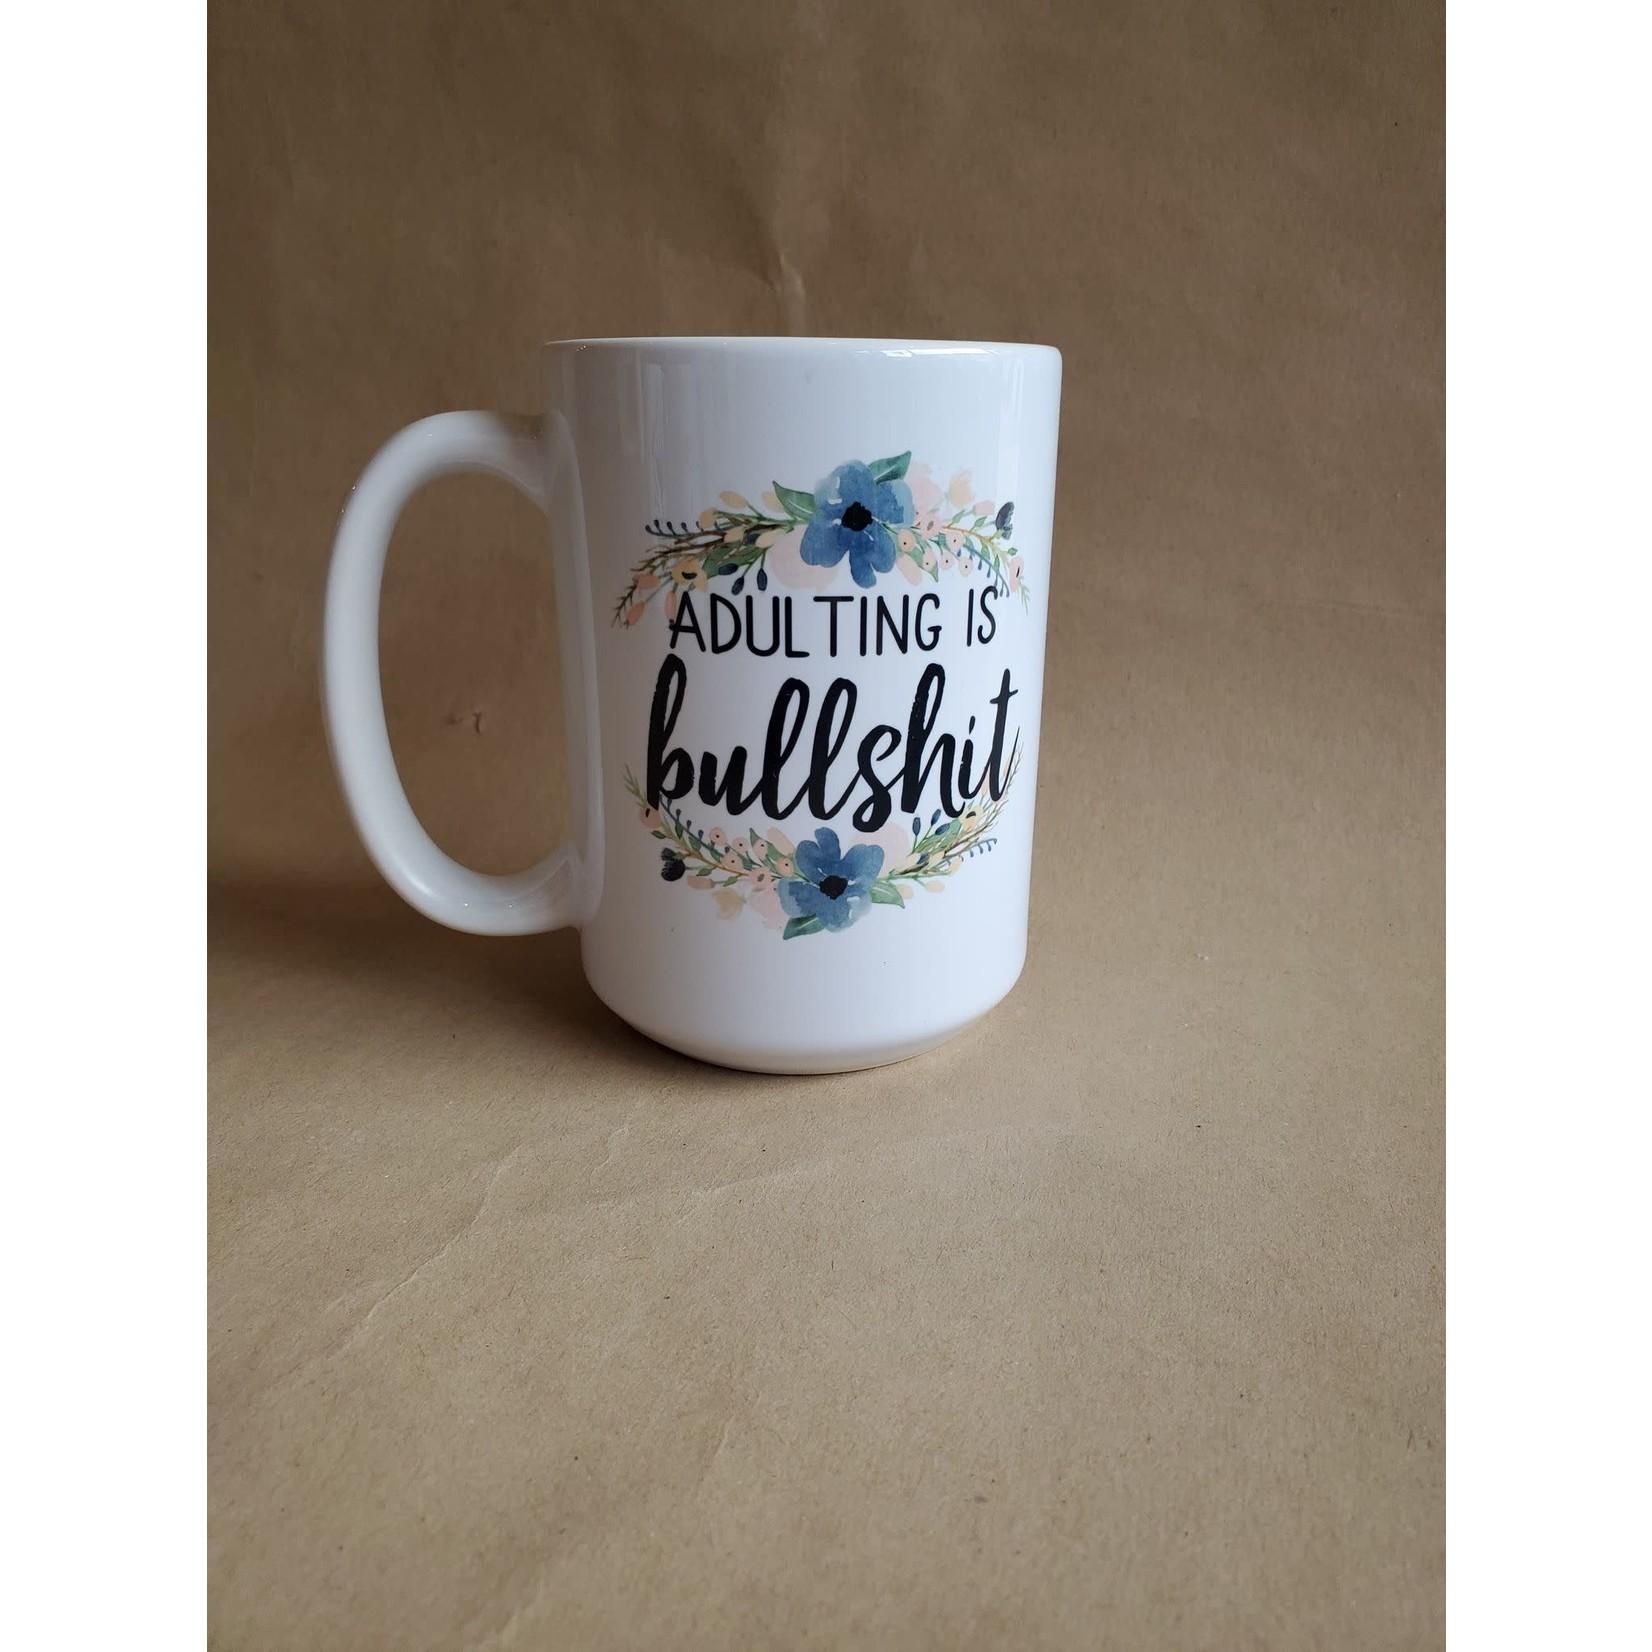 favourite things apparel Adulting is bullshit mug